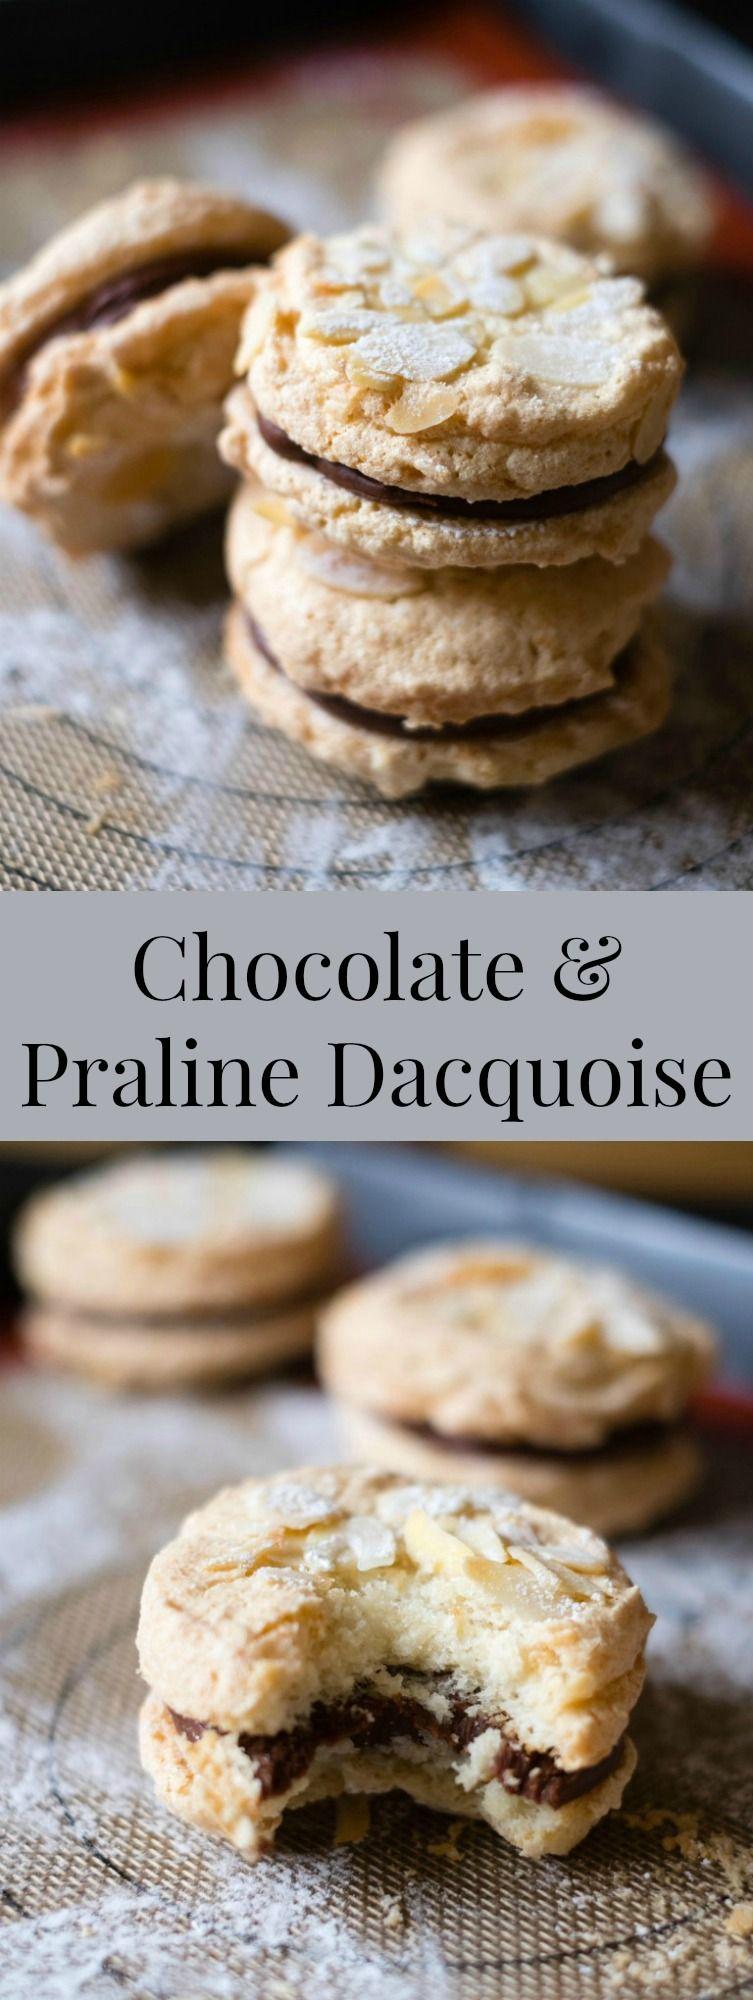 Chocolate & Praline Dacquoise